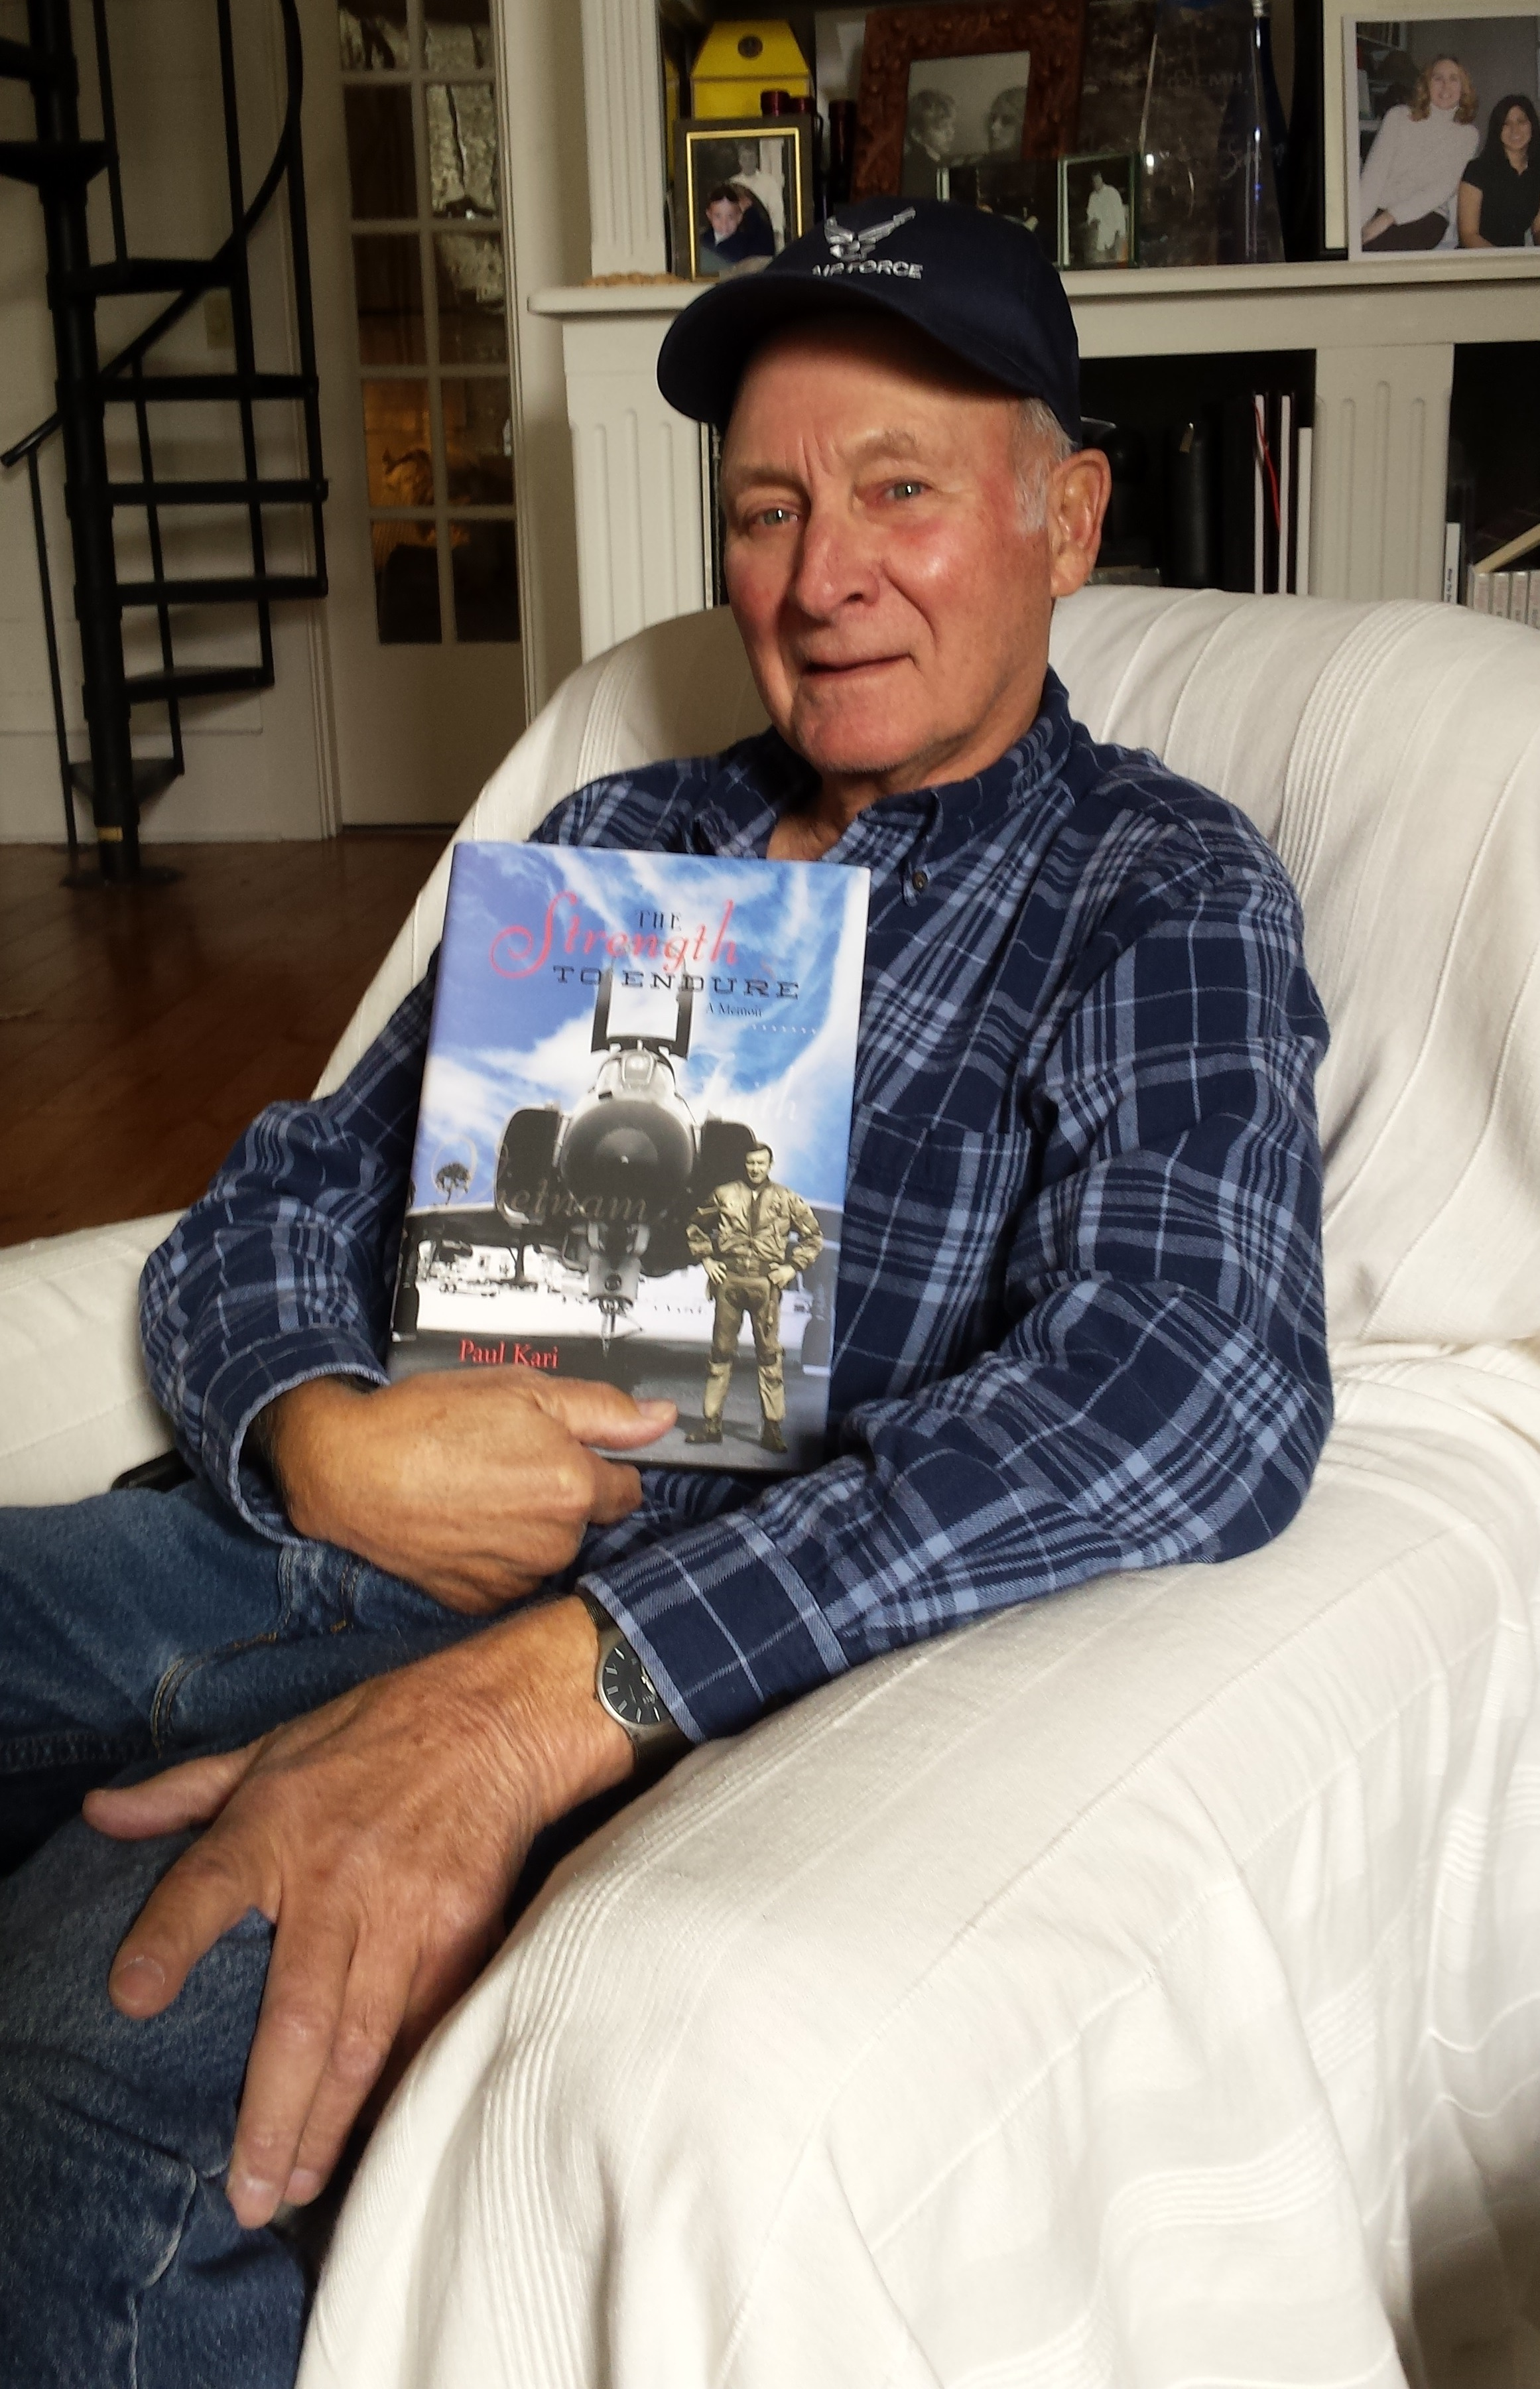 Paul Kari with his memoir, The Strength to Endure, a custom book published by Orange Frazer Press